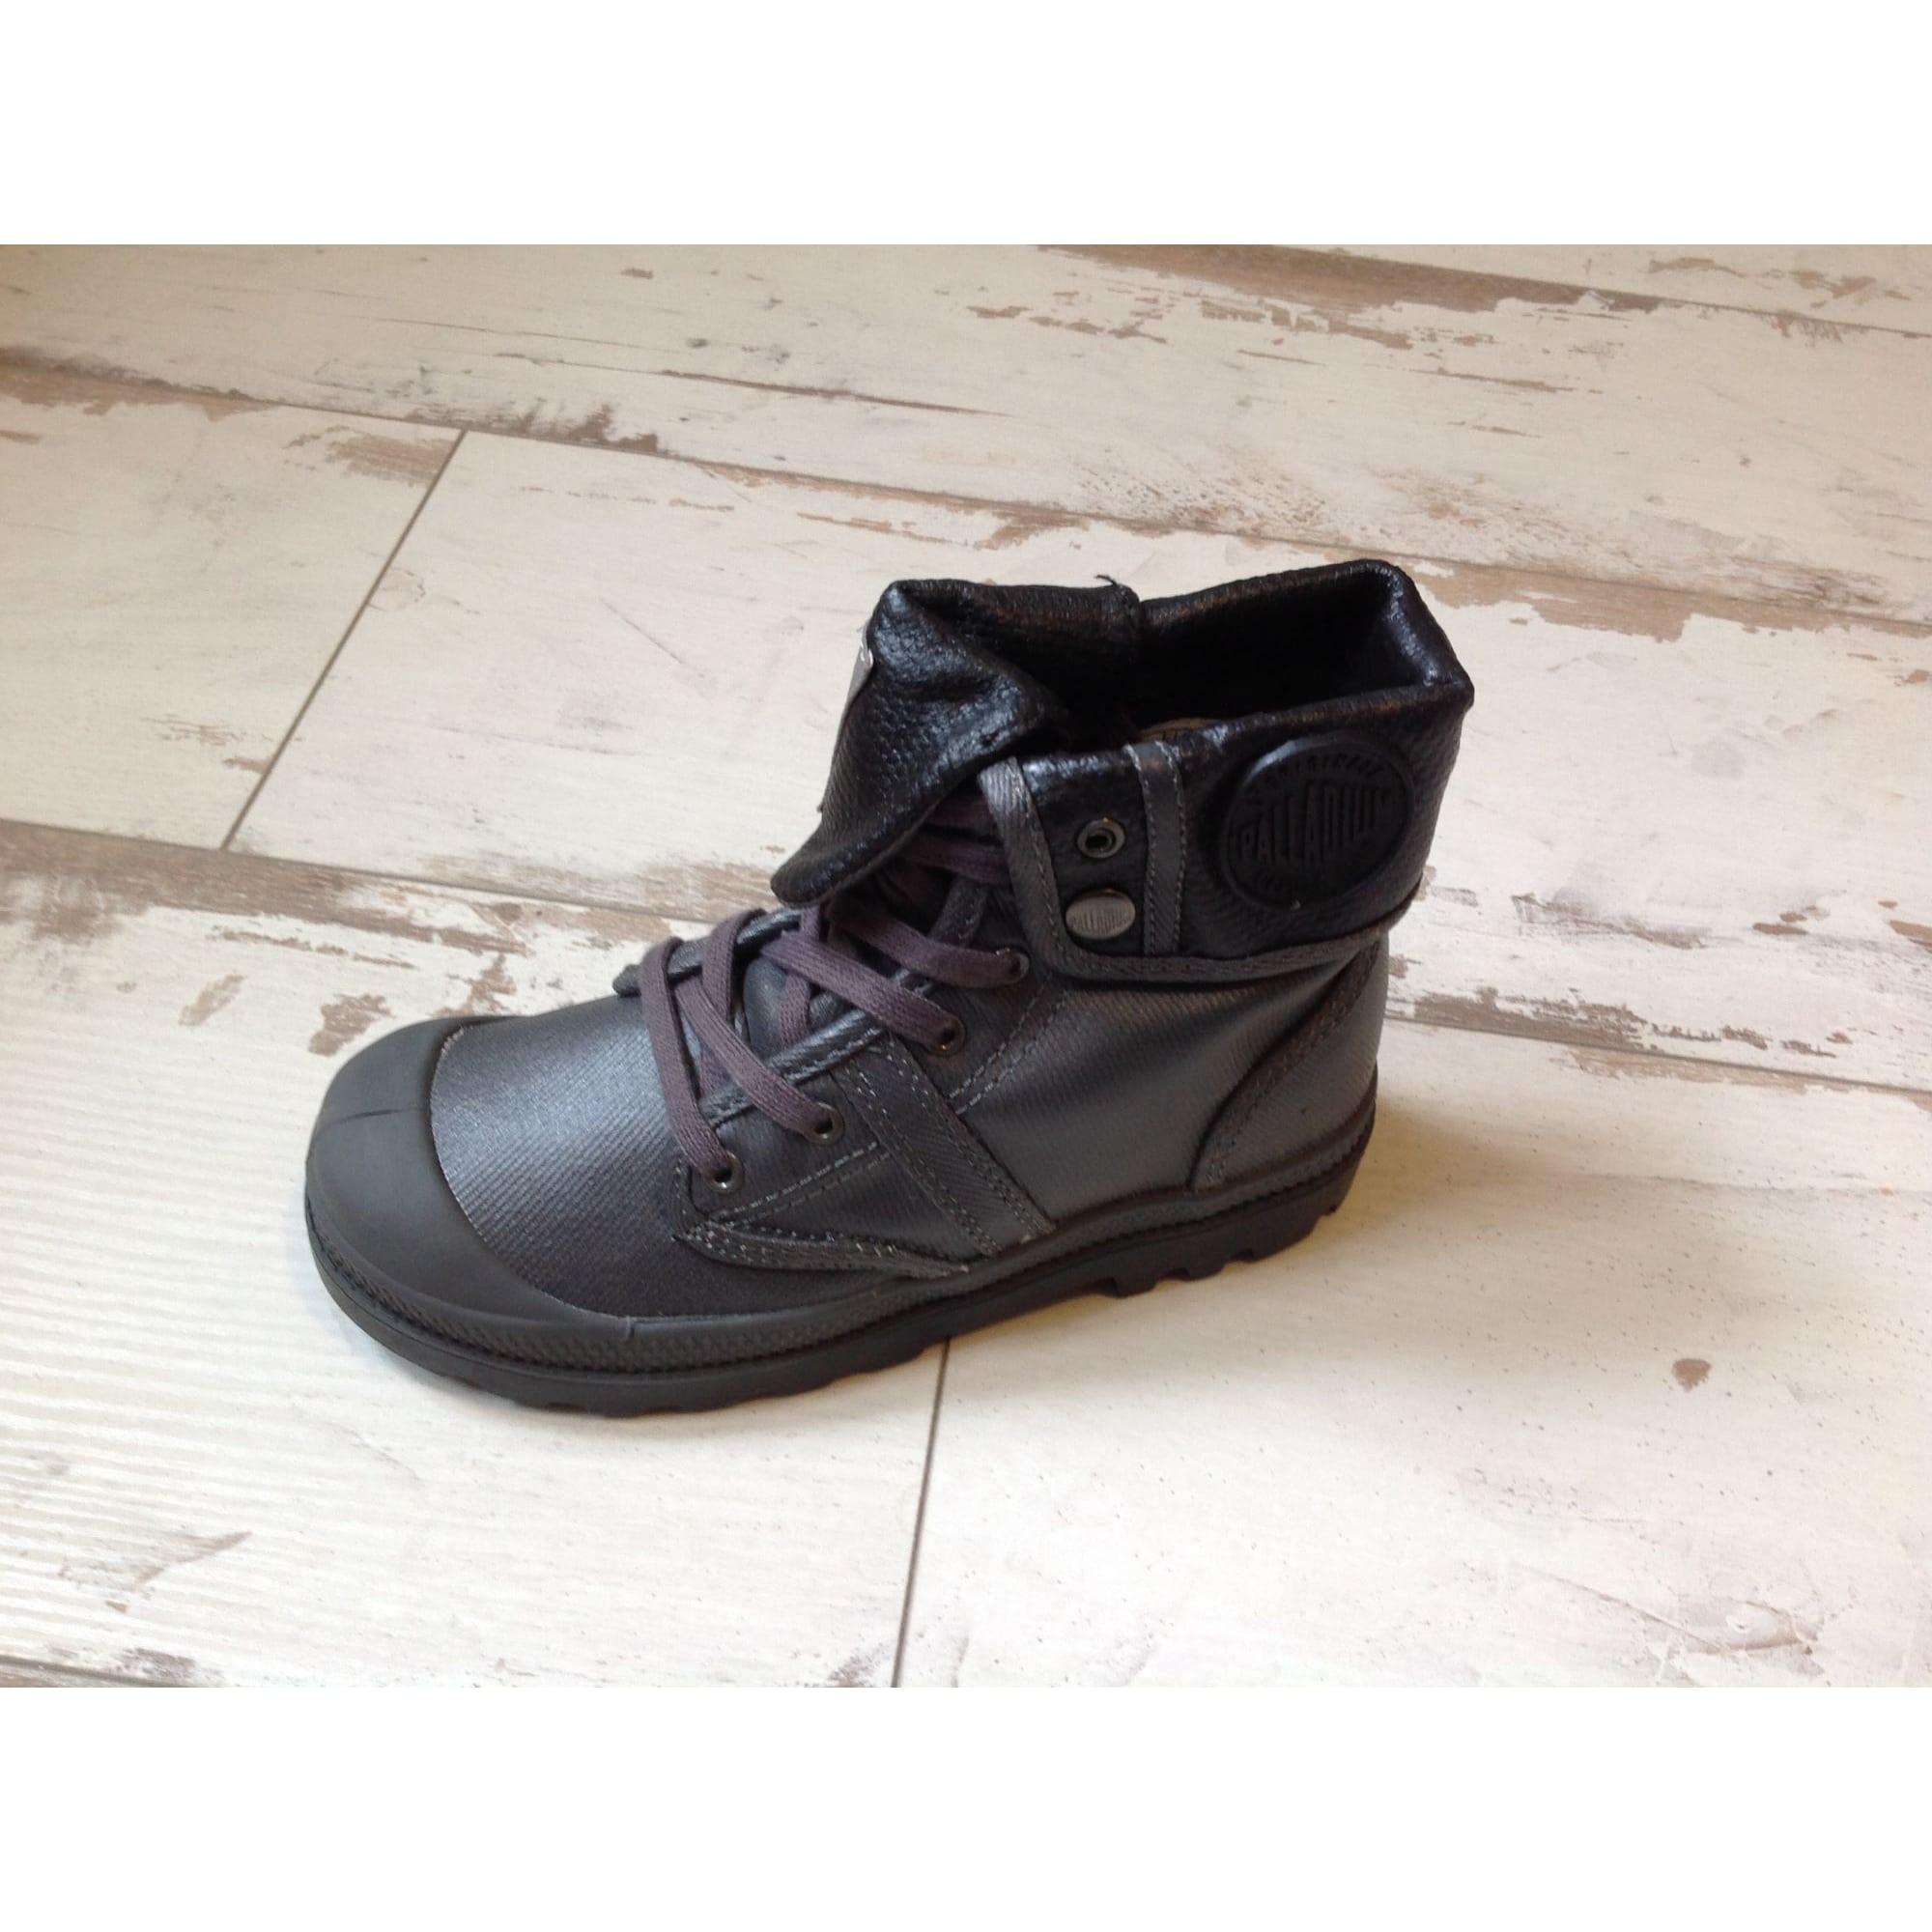 30 Gris Chaussures À Palladium Lacets 8010314 xwP8CT